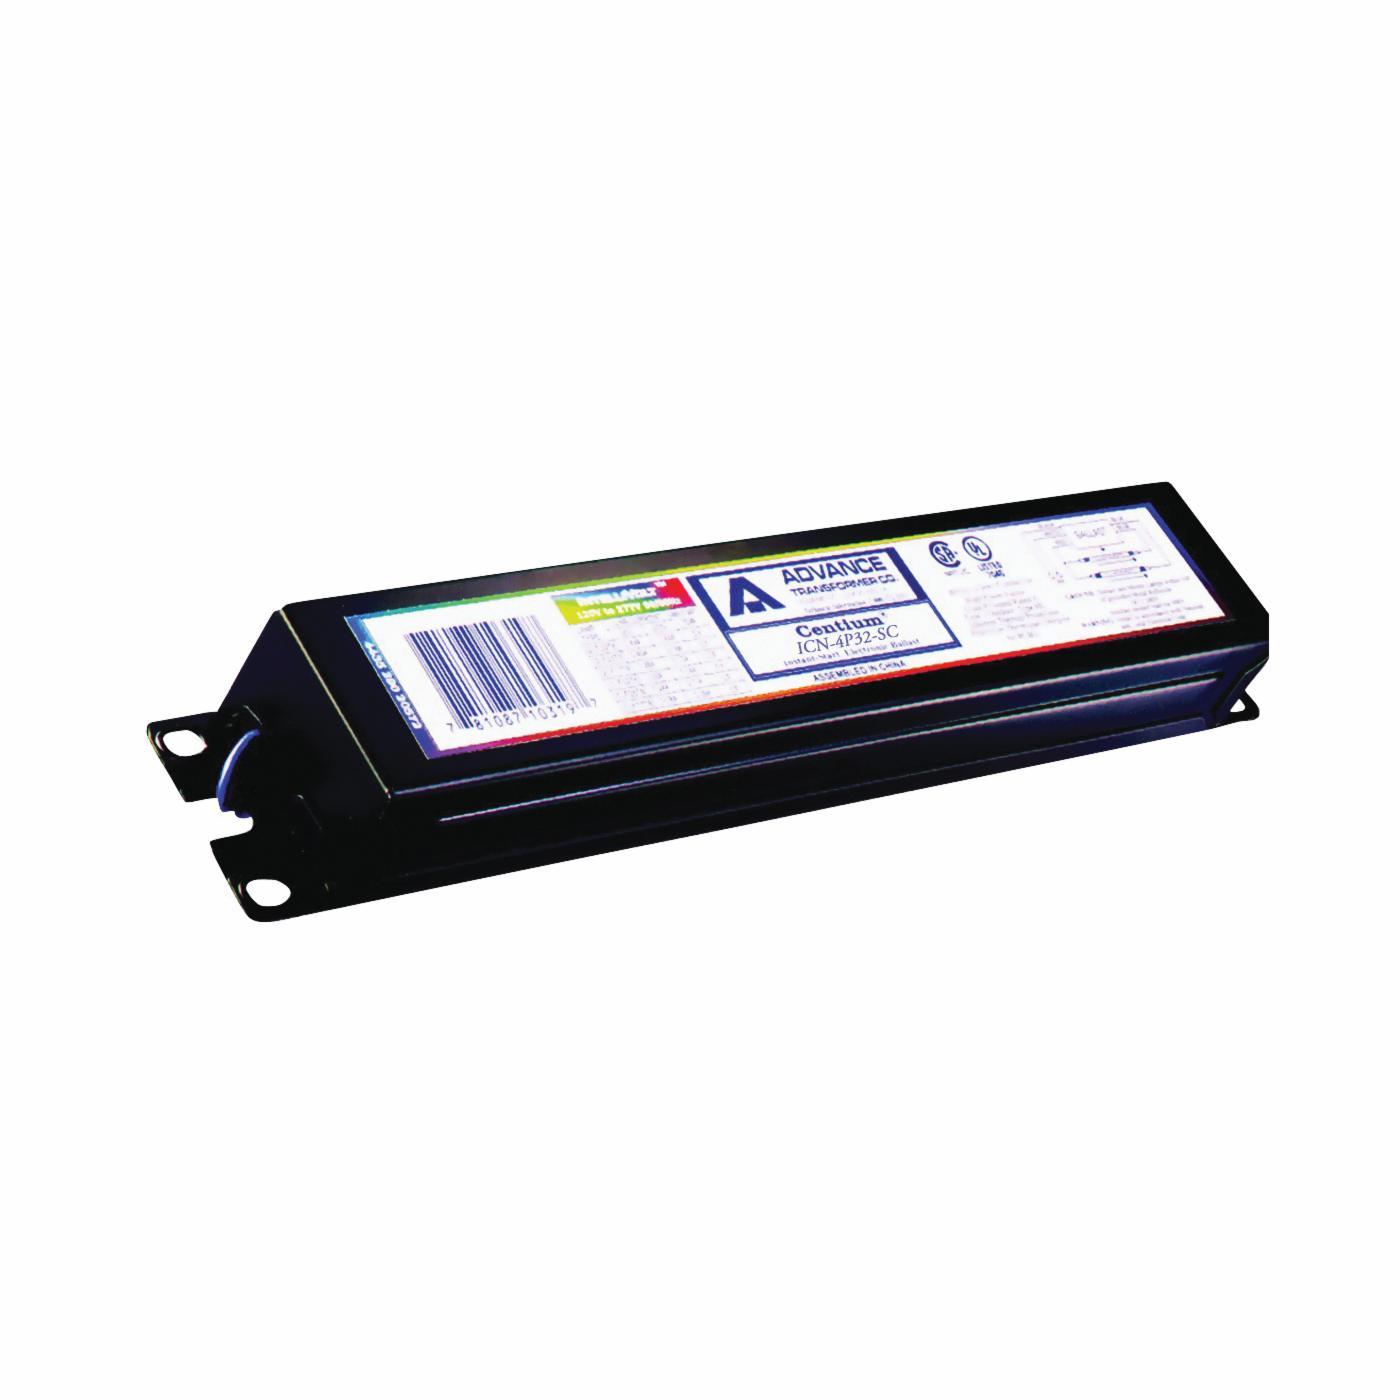 Philips Advance ICN4P32N35I